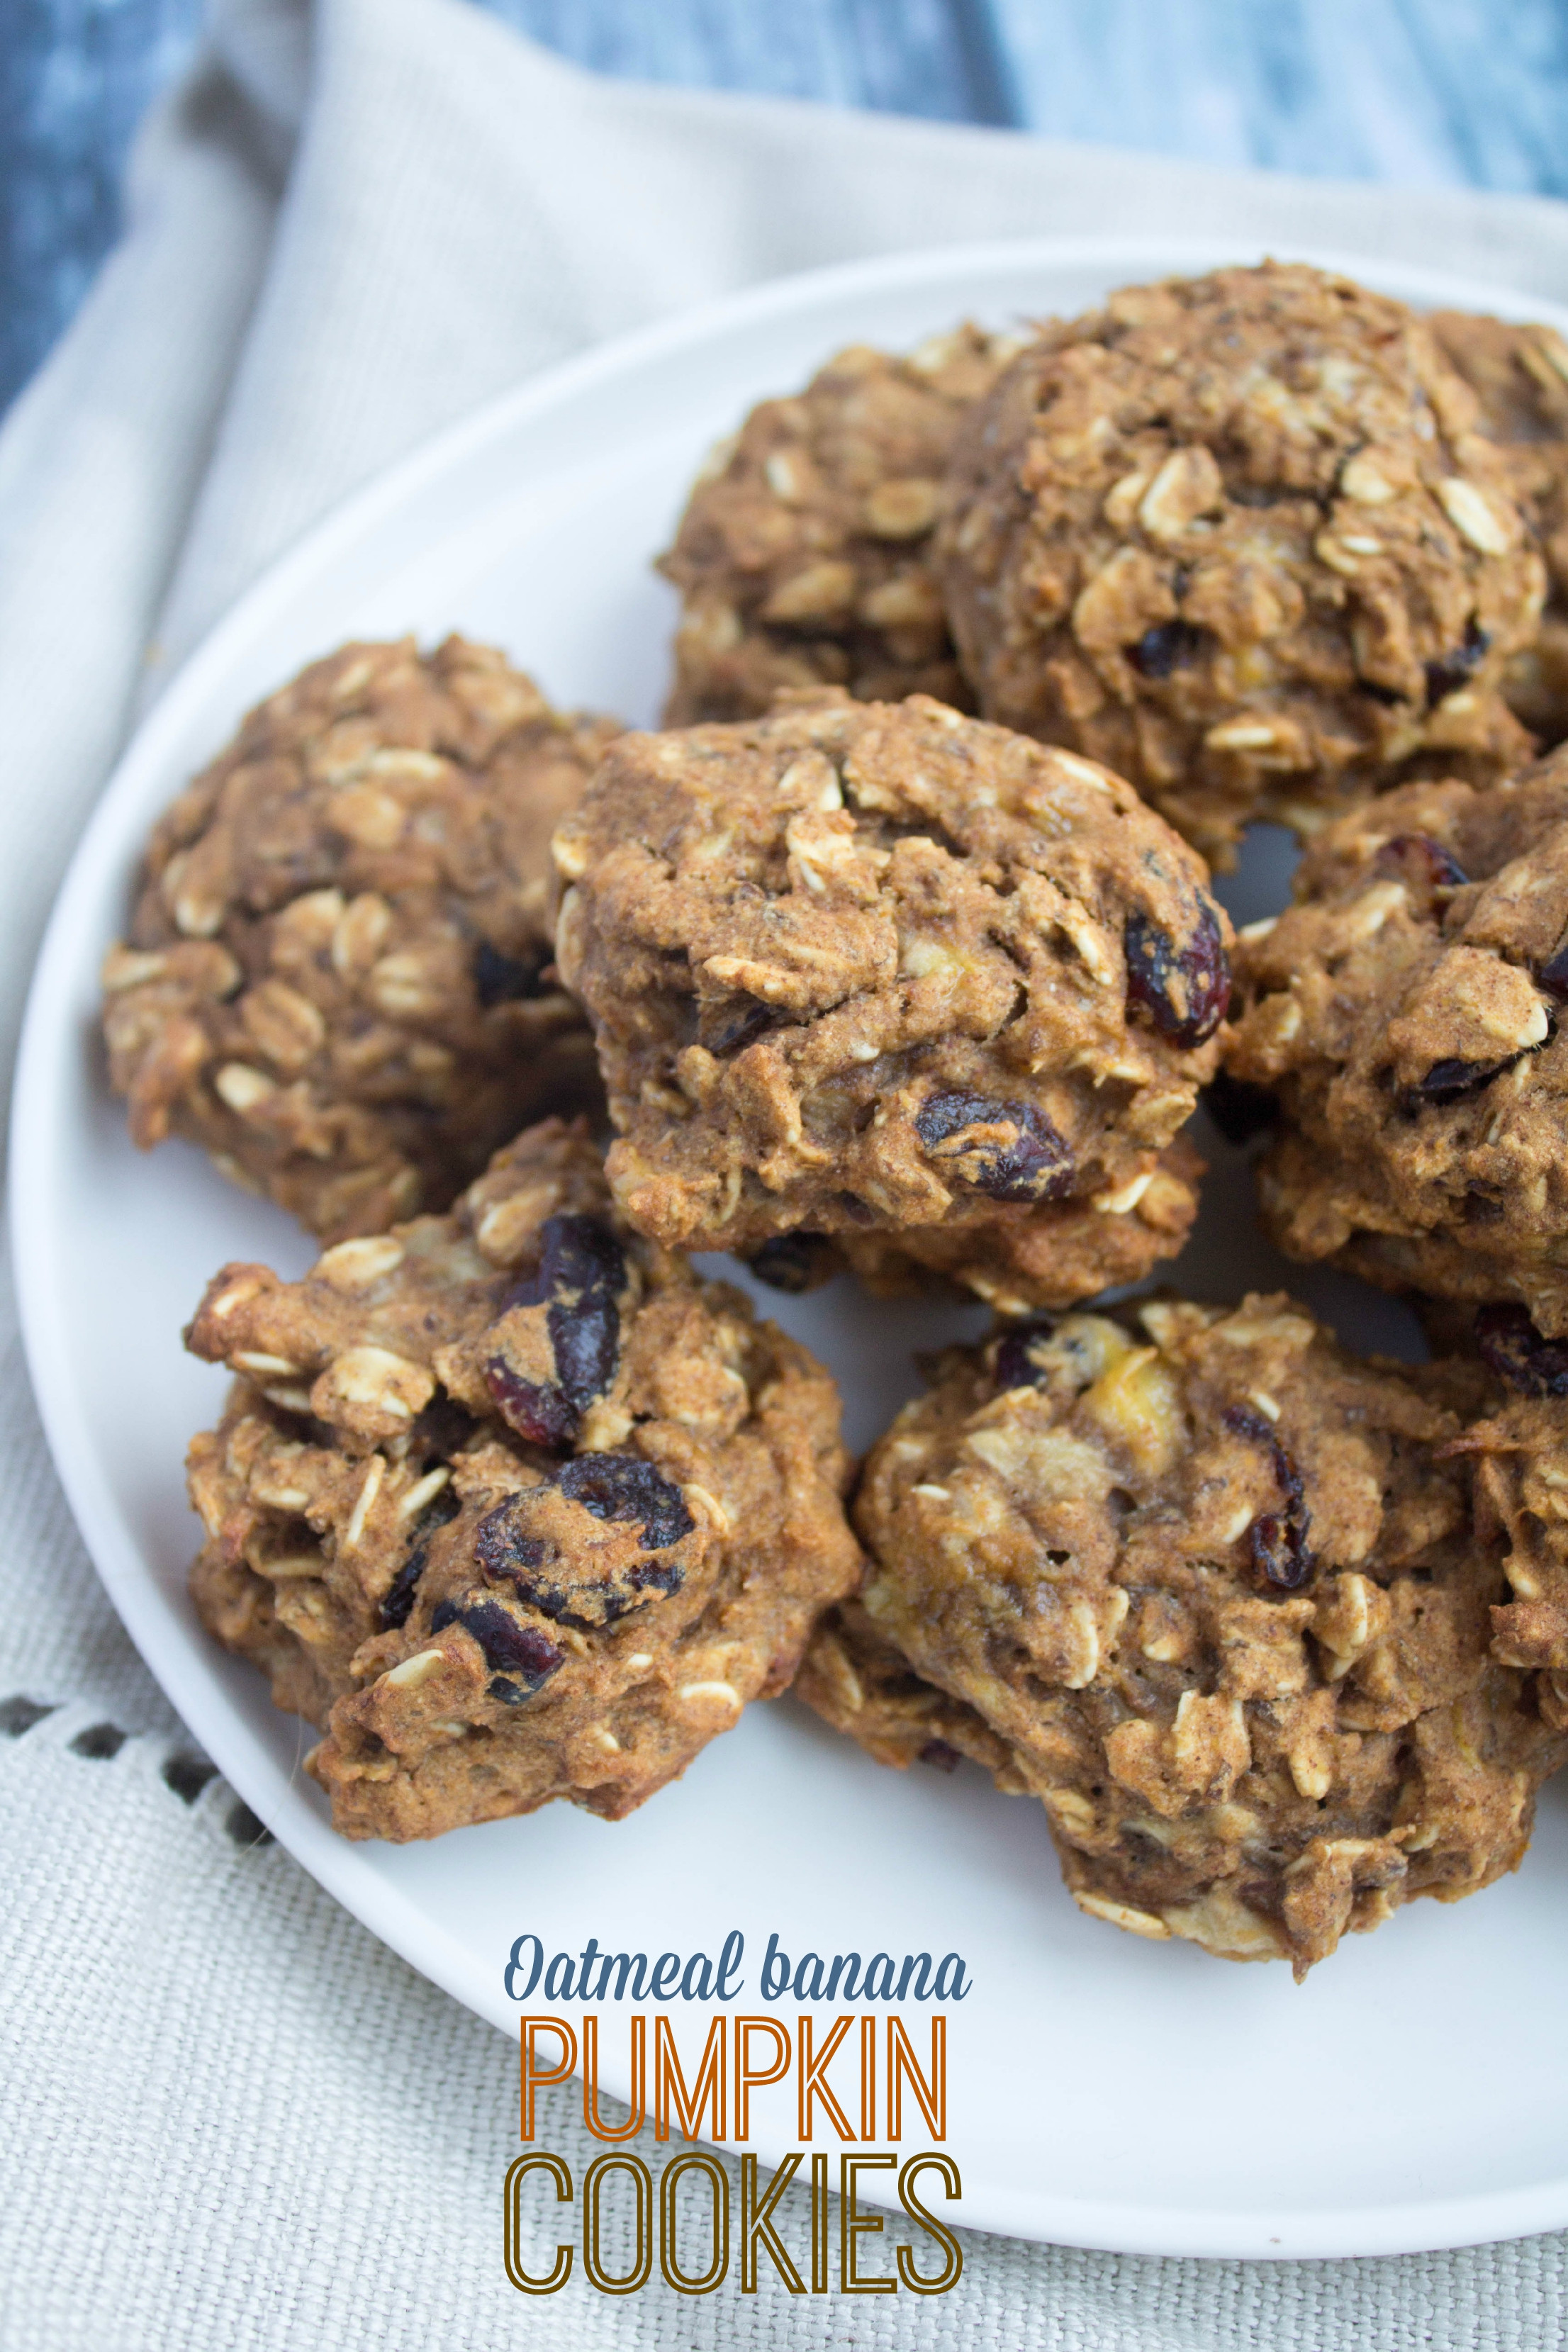 Healthy Pumpkin Cookies No Sugar  Oatmeal Banana Pumpkin Cookies